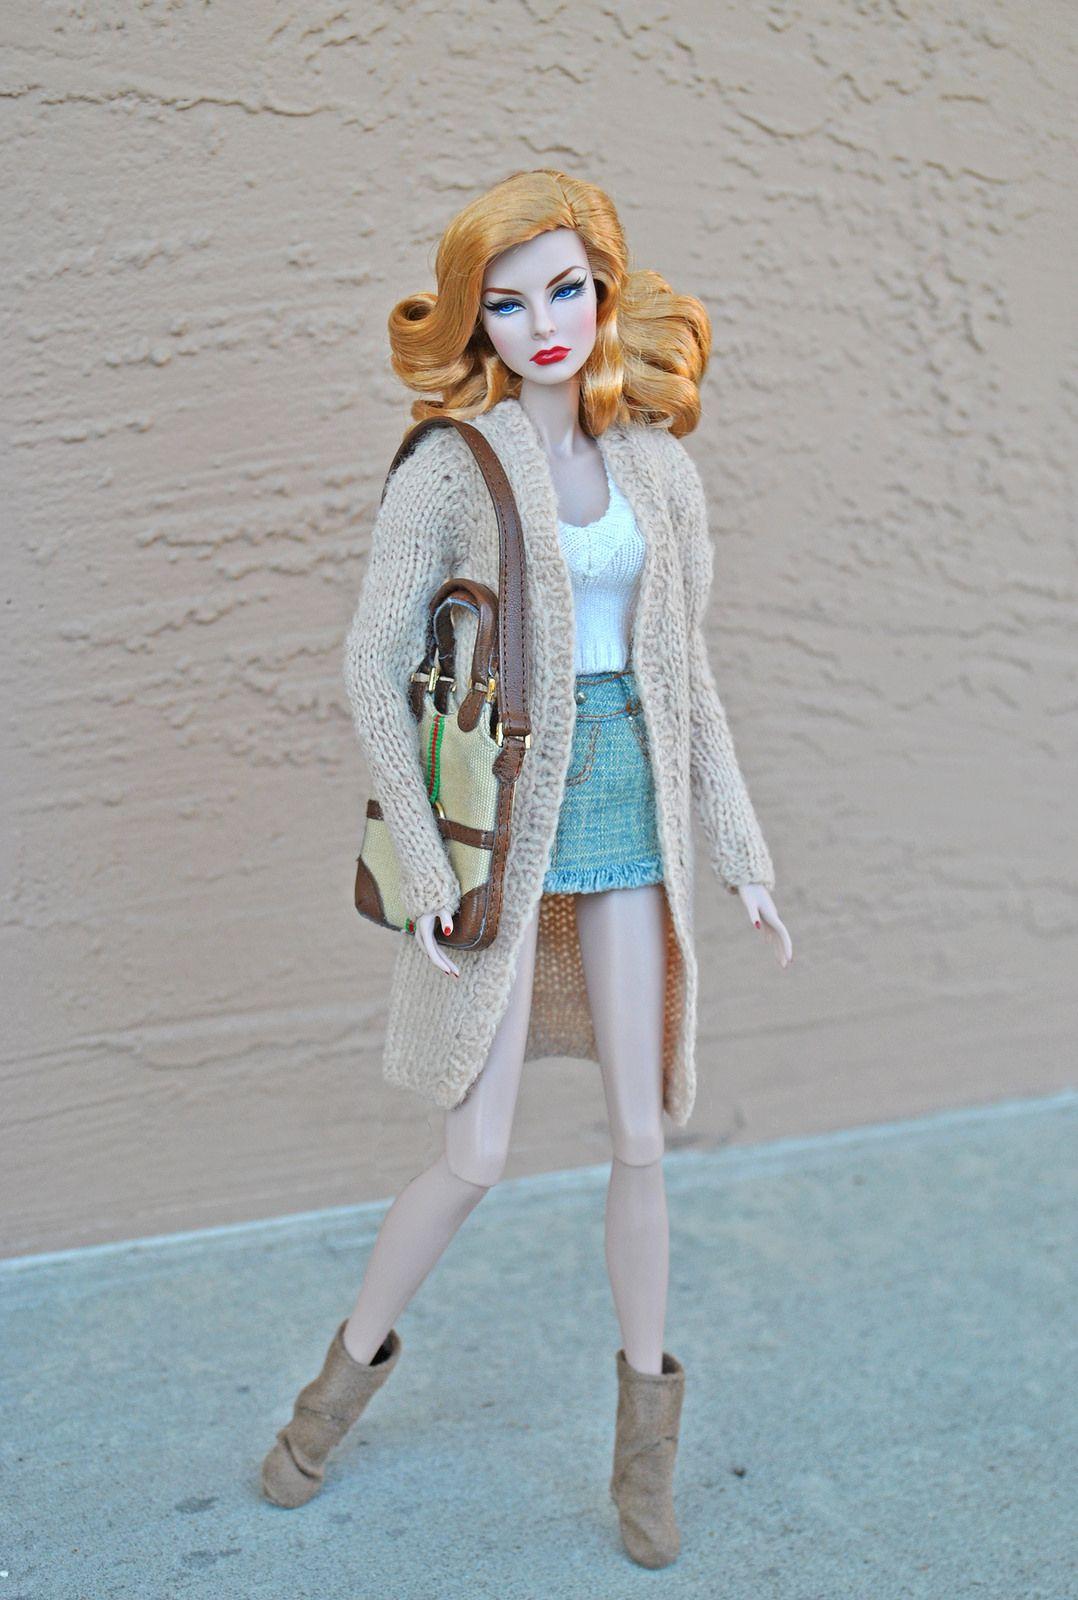 Flickr | Barbie บาบี้ แฟชั่น1 | Pinterest